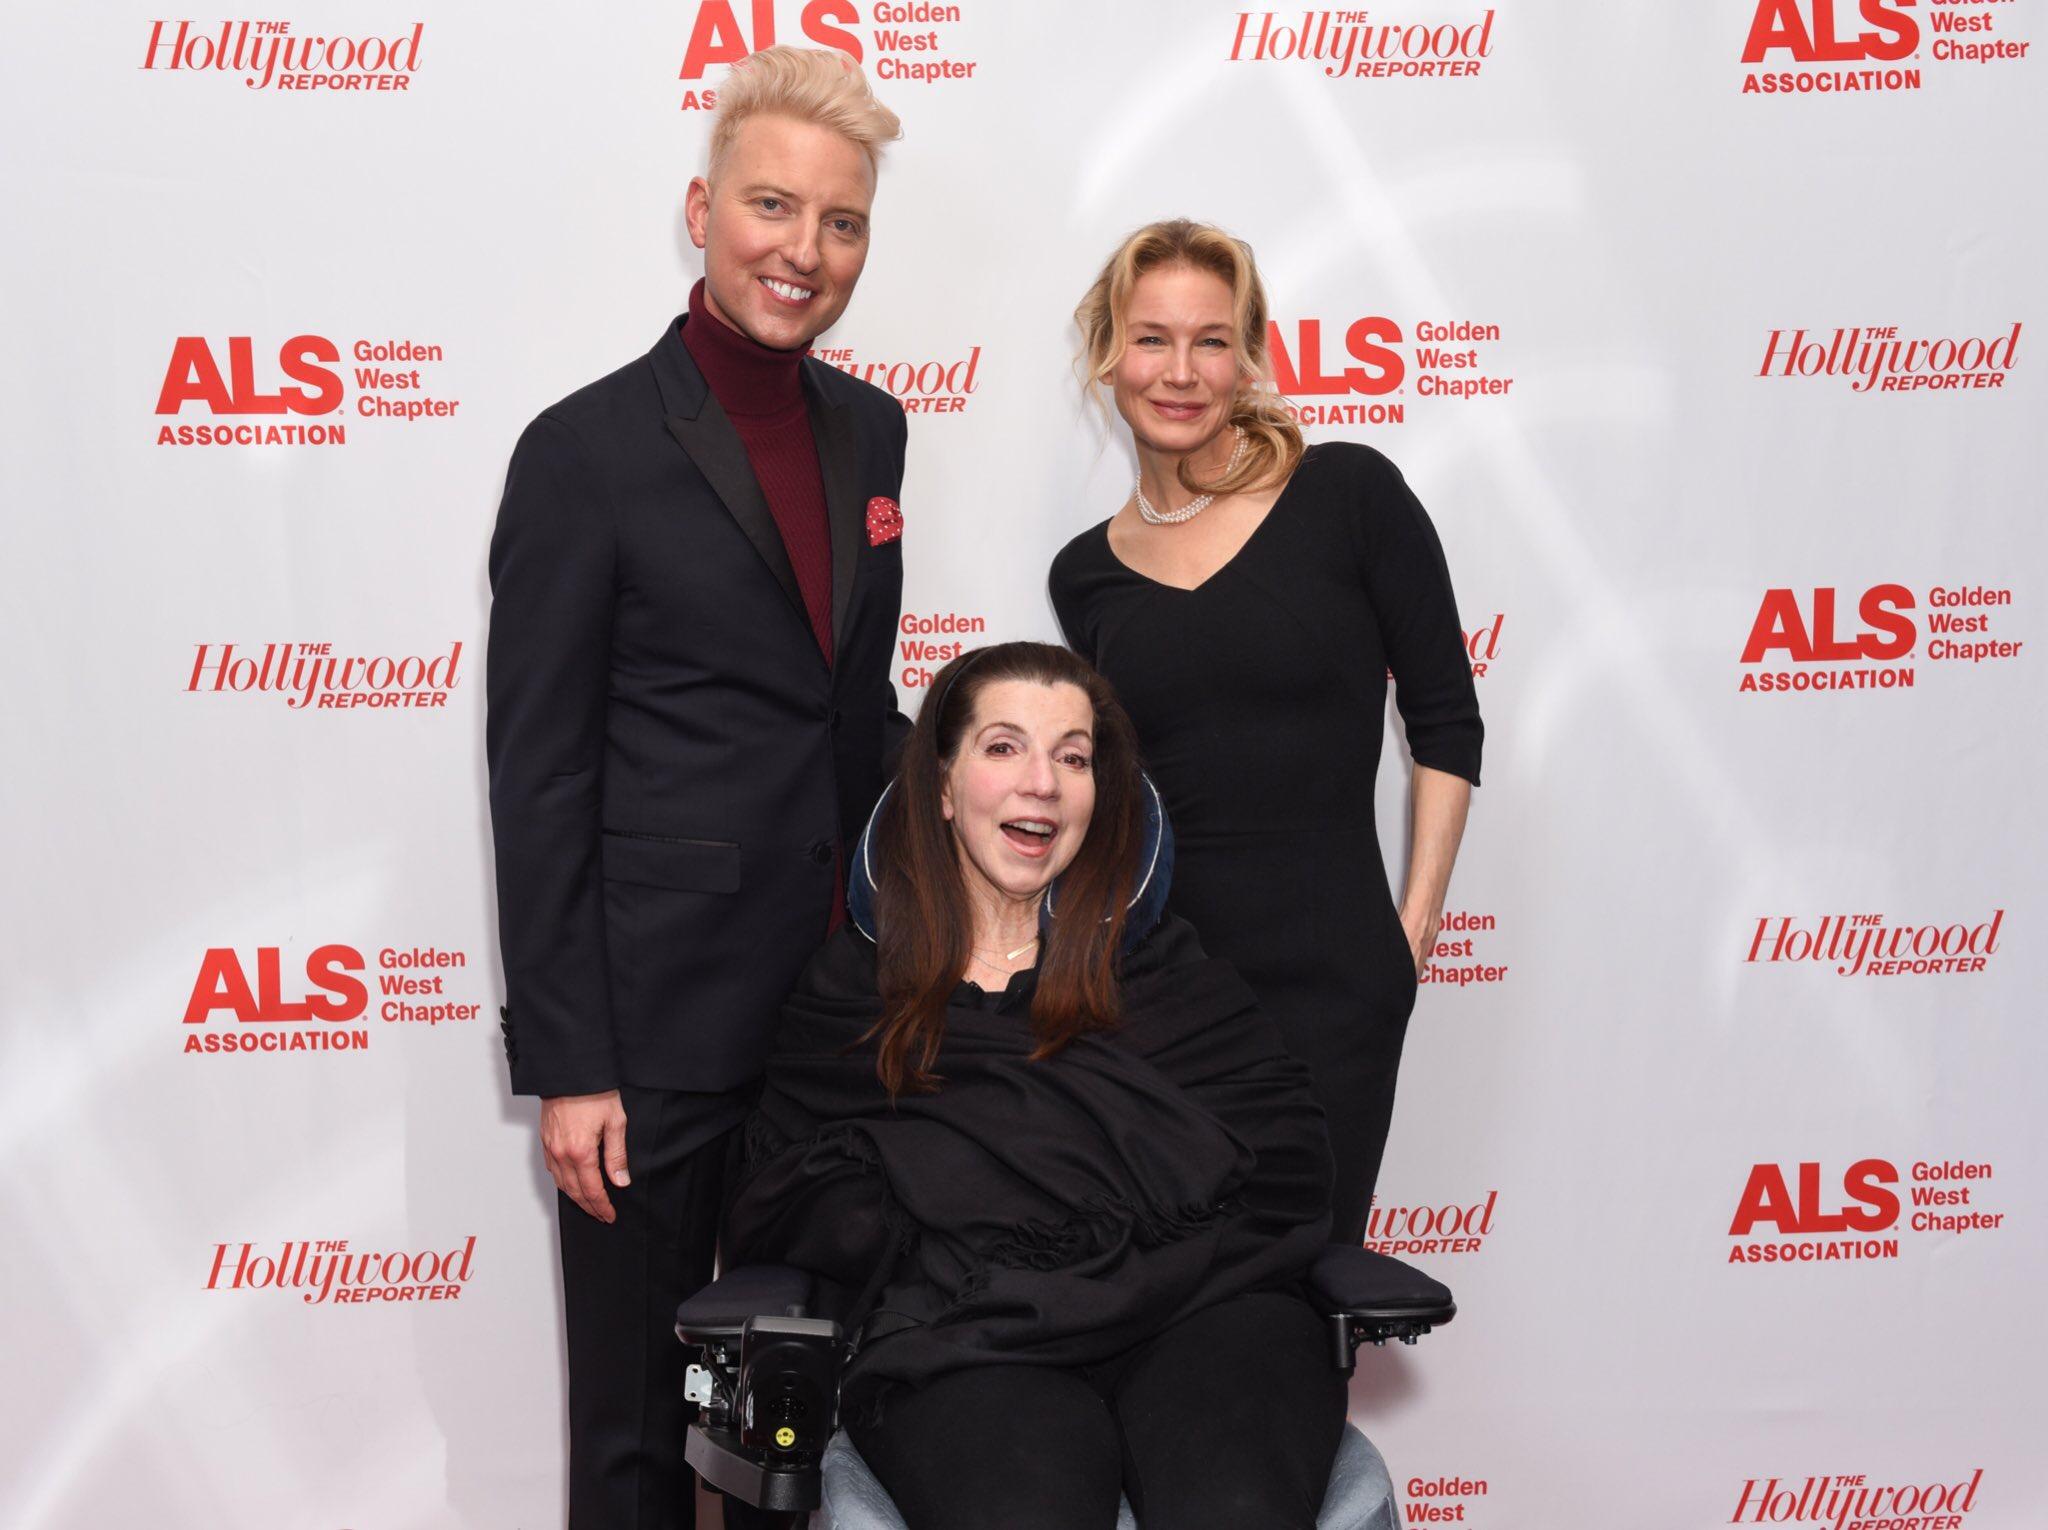 Chris Gardner with Nanci Ryder and Renée Zellweger